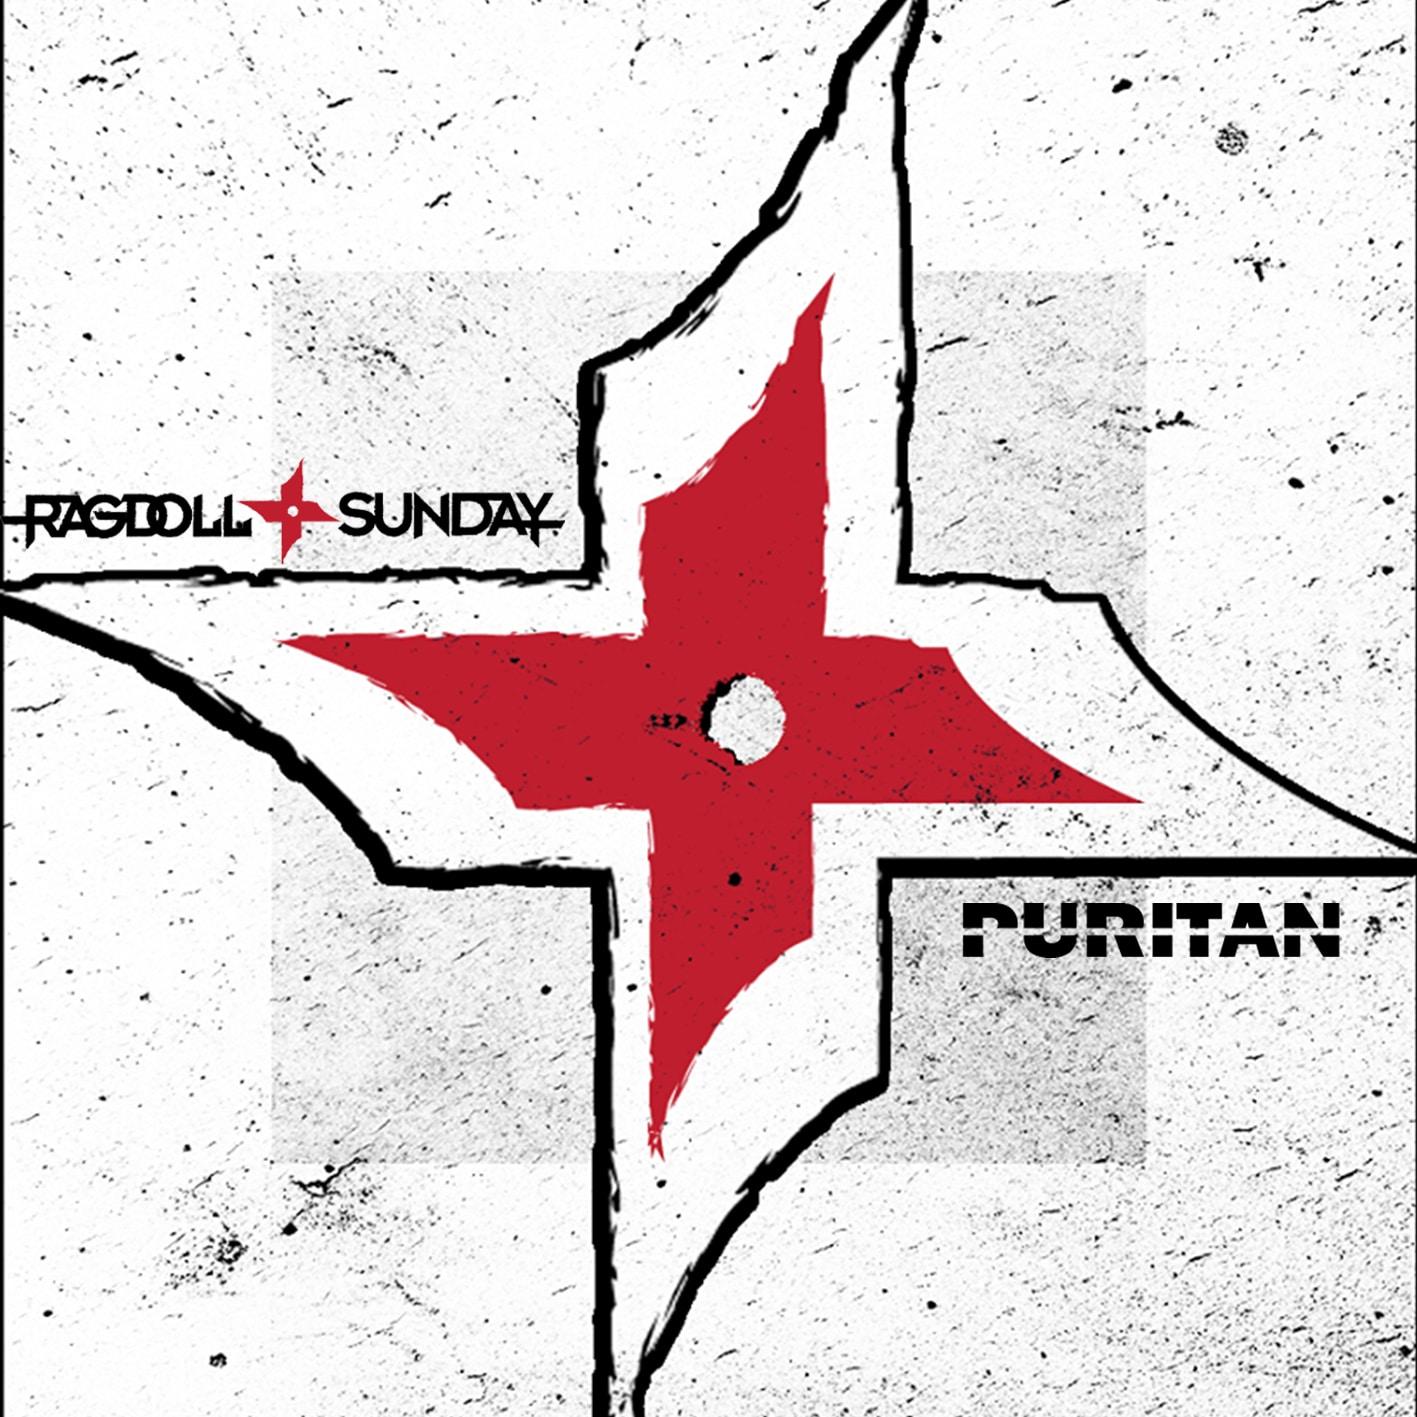 Ragdoll Sunday - Puritan